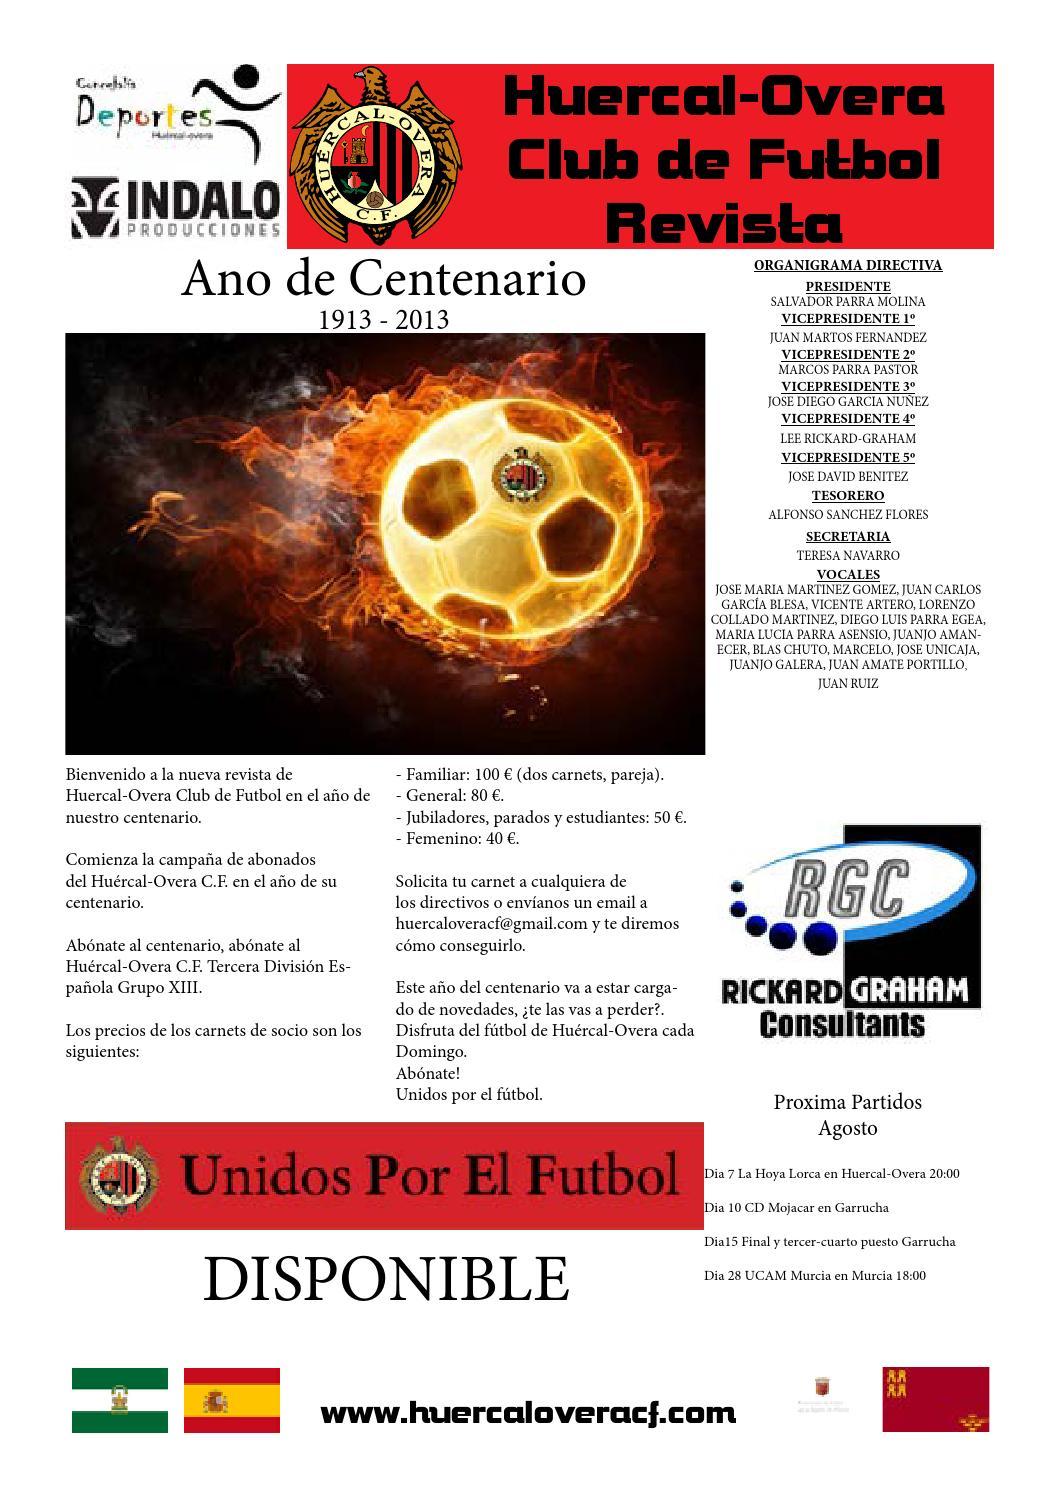 Magazine1 by Lee Rickard-Graham - issuu